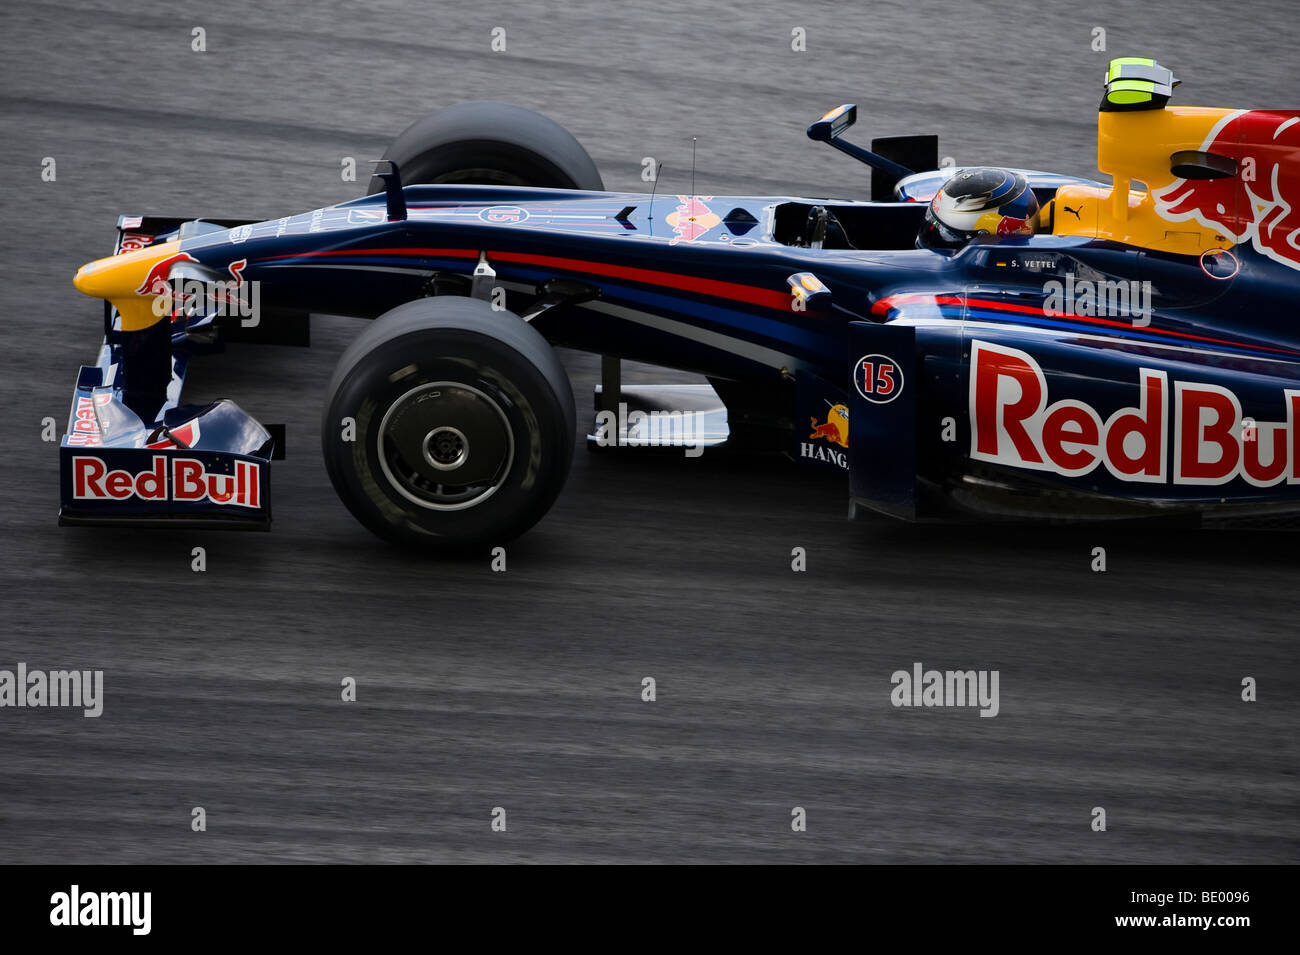 Red Bull Racing driver Sebastian Vettel of Germany steers his car during the 2009 Fia Formula One Malasyan Grand - Stock Image